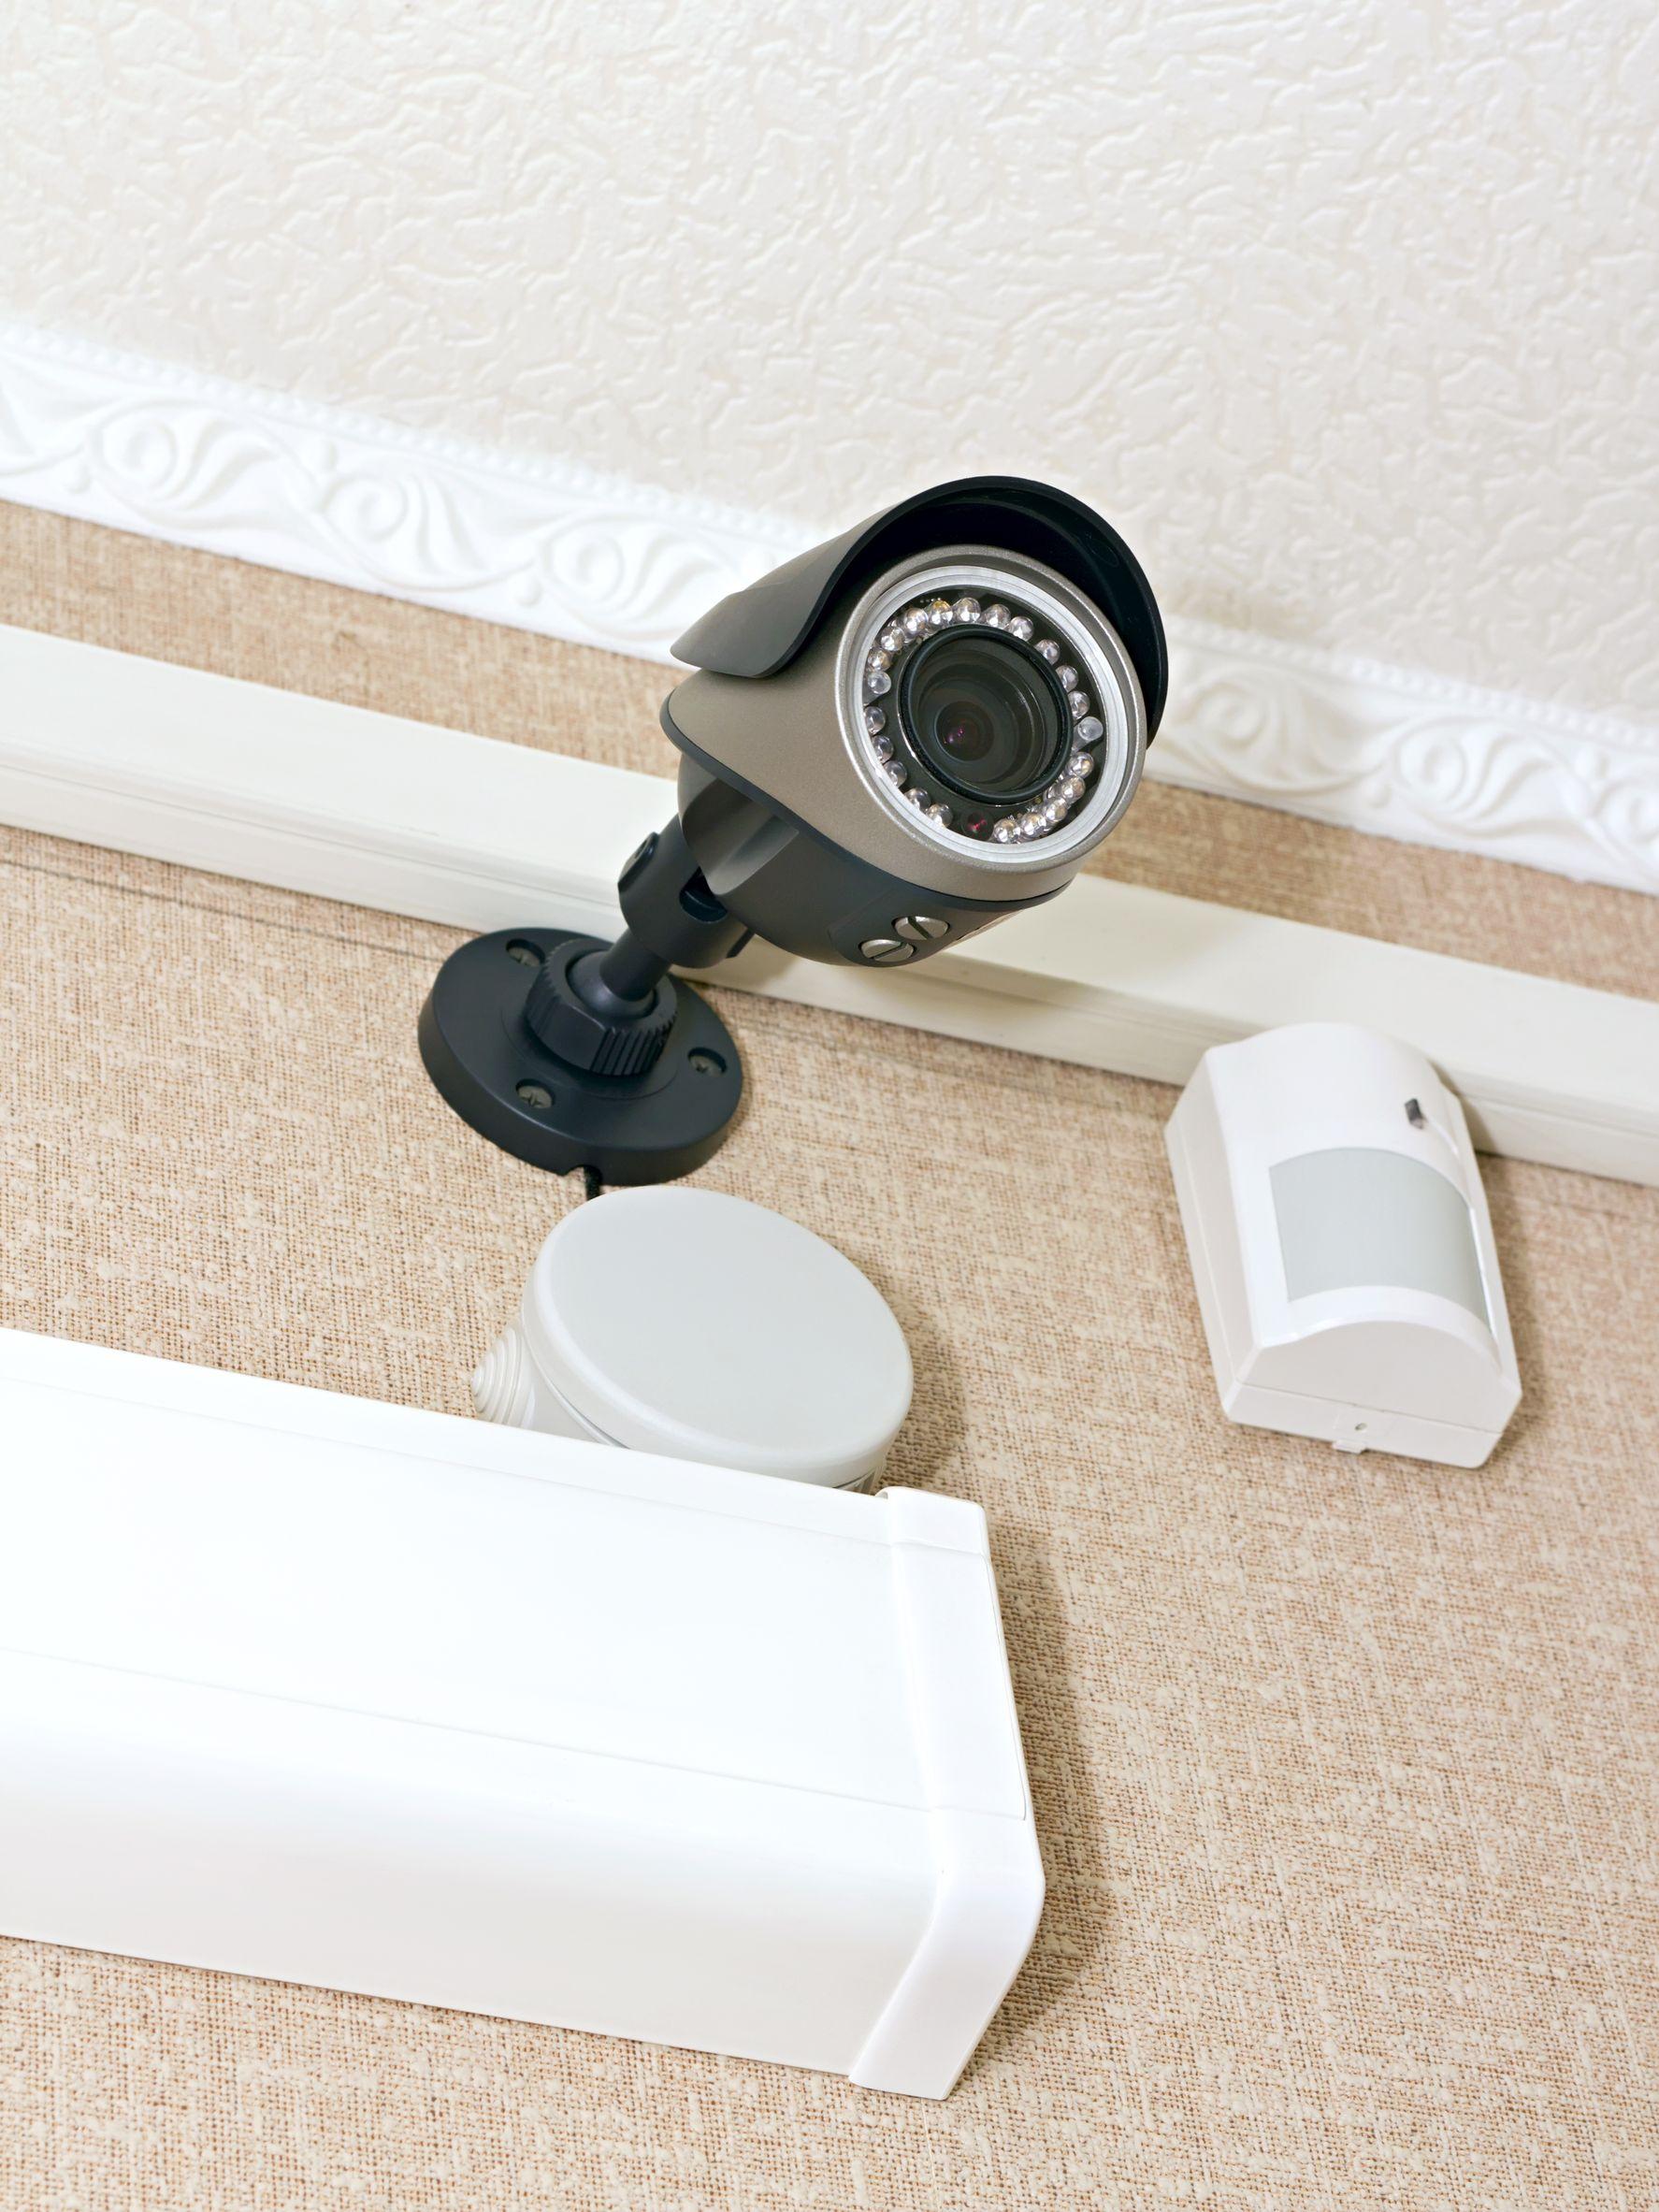 CCTV Camera Orlando FL